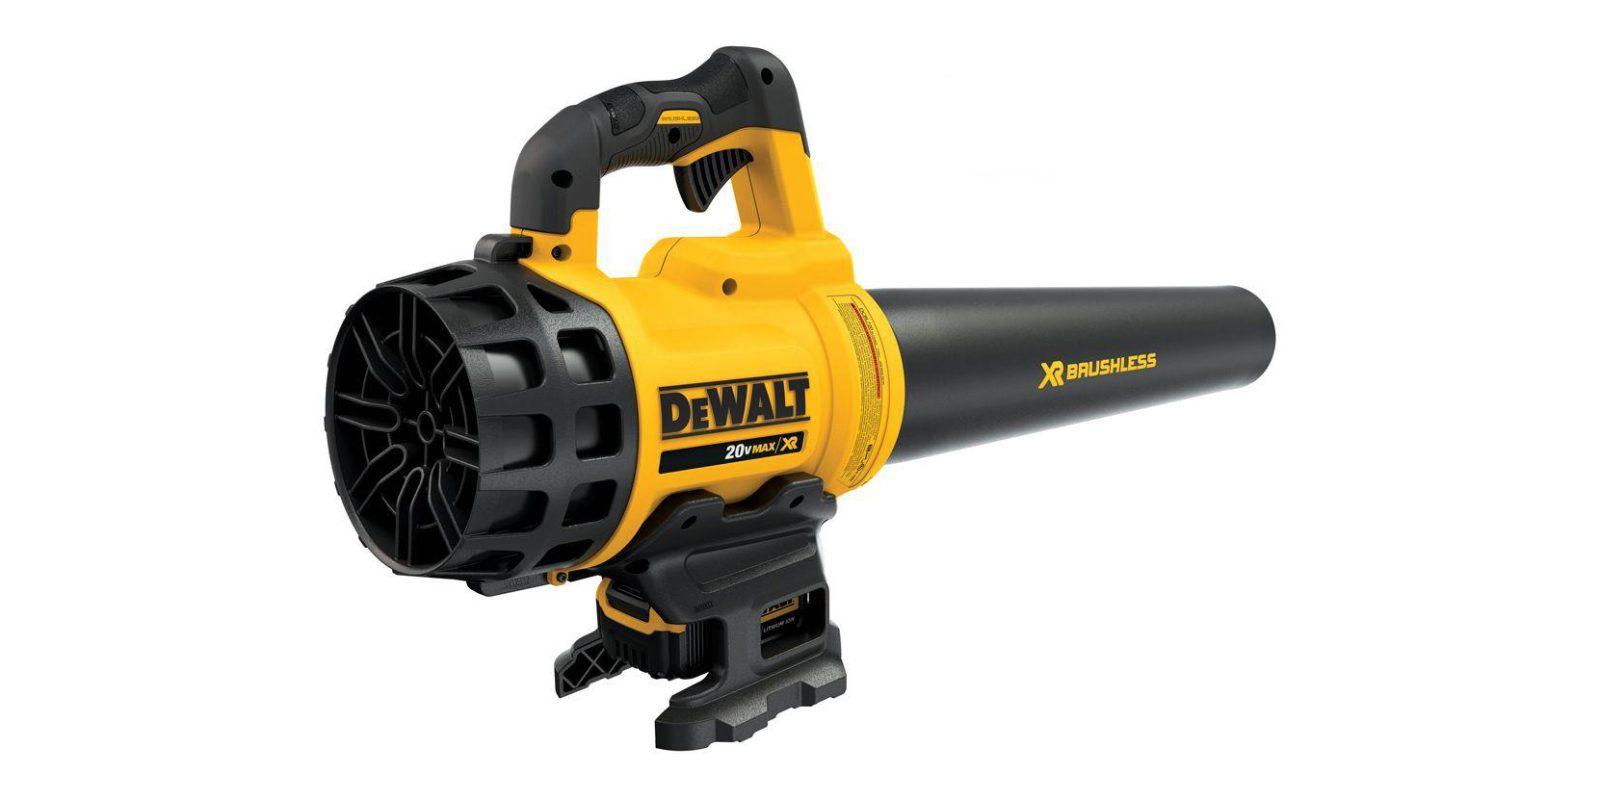 DEWALT 20V Cordless Electric Leaf Blower $179, more in today's Green Deals